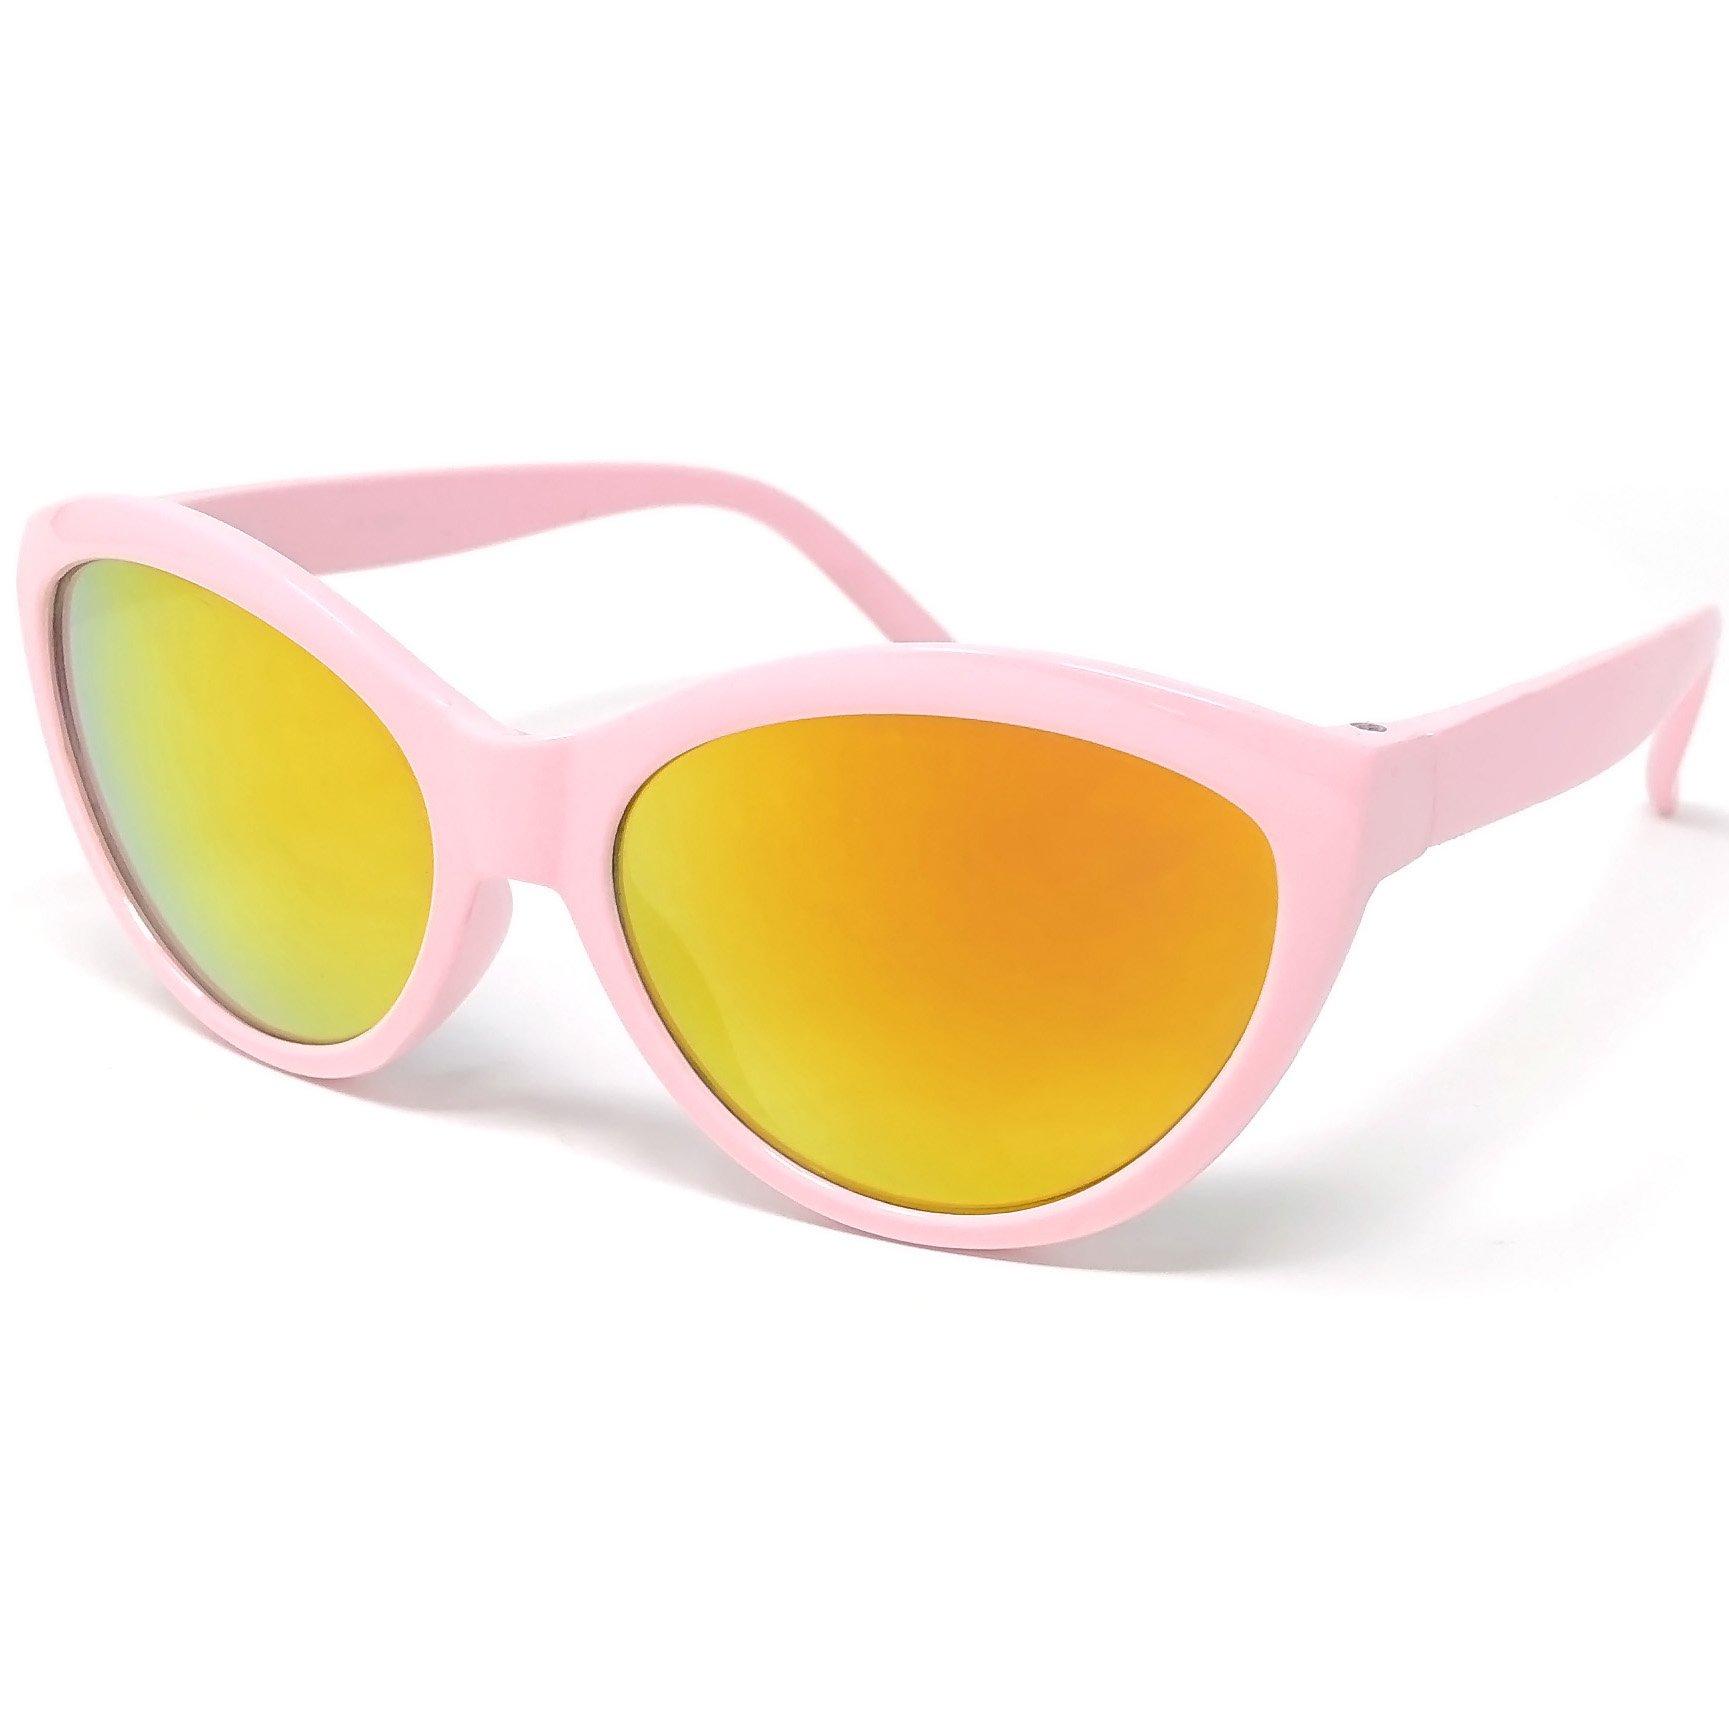 Loose Leaf Eyewear Kids Girls Pink Cateye Sunglasses in Revo Lens with Unicorn Print Case